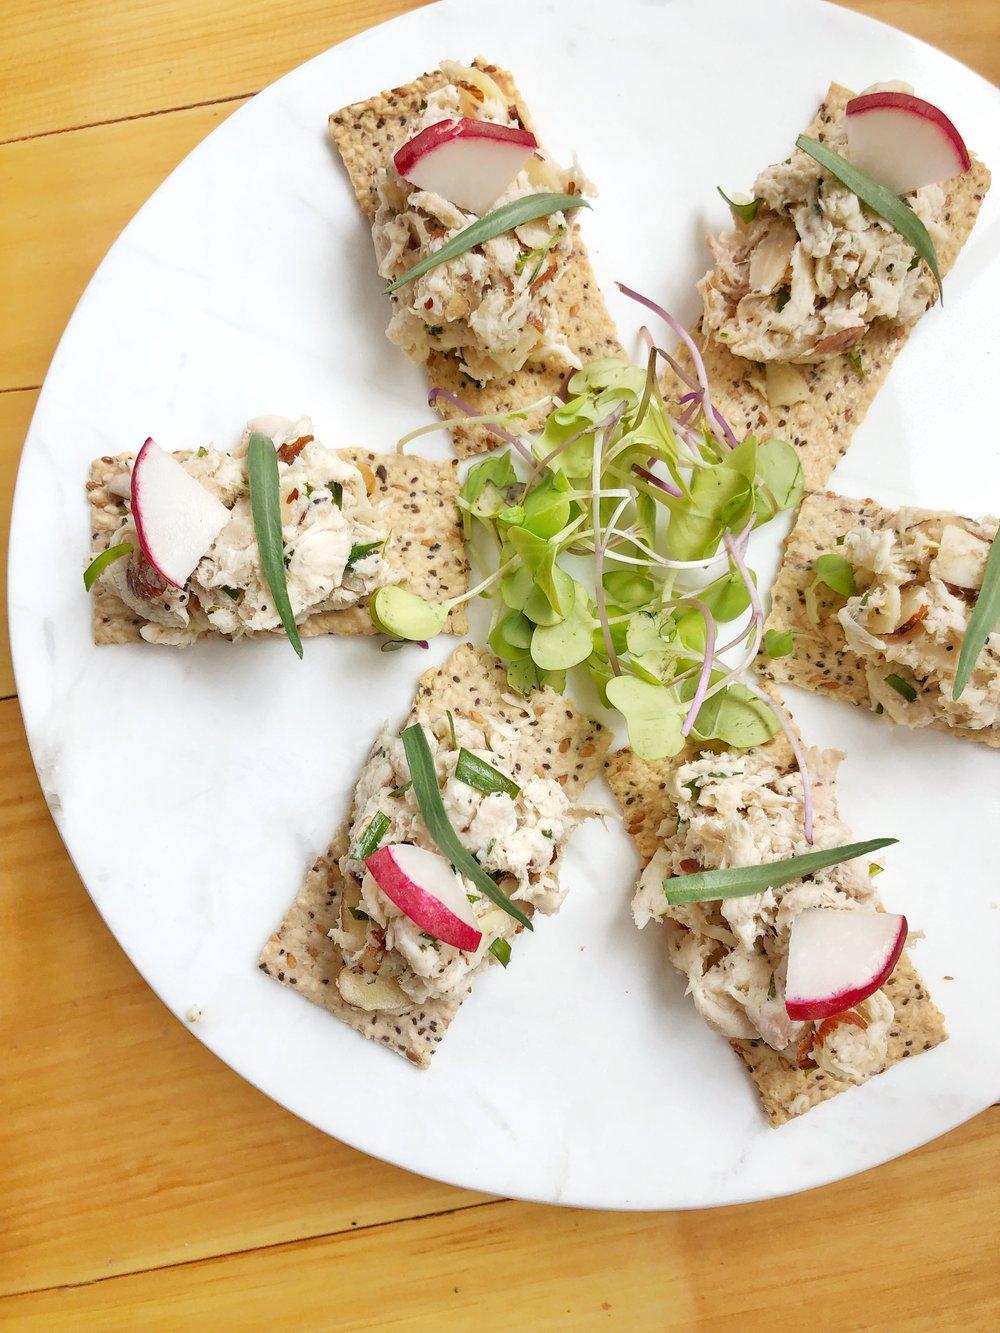 Tarragon & Almond Chicken Salad.jpg-clean-chicken-salad-whole-30-recipe-lunch-clean-eating